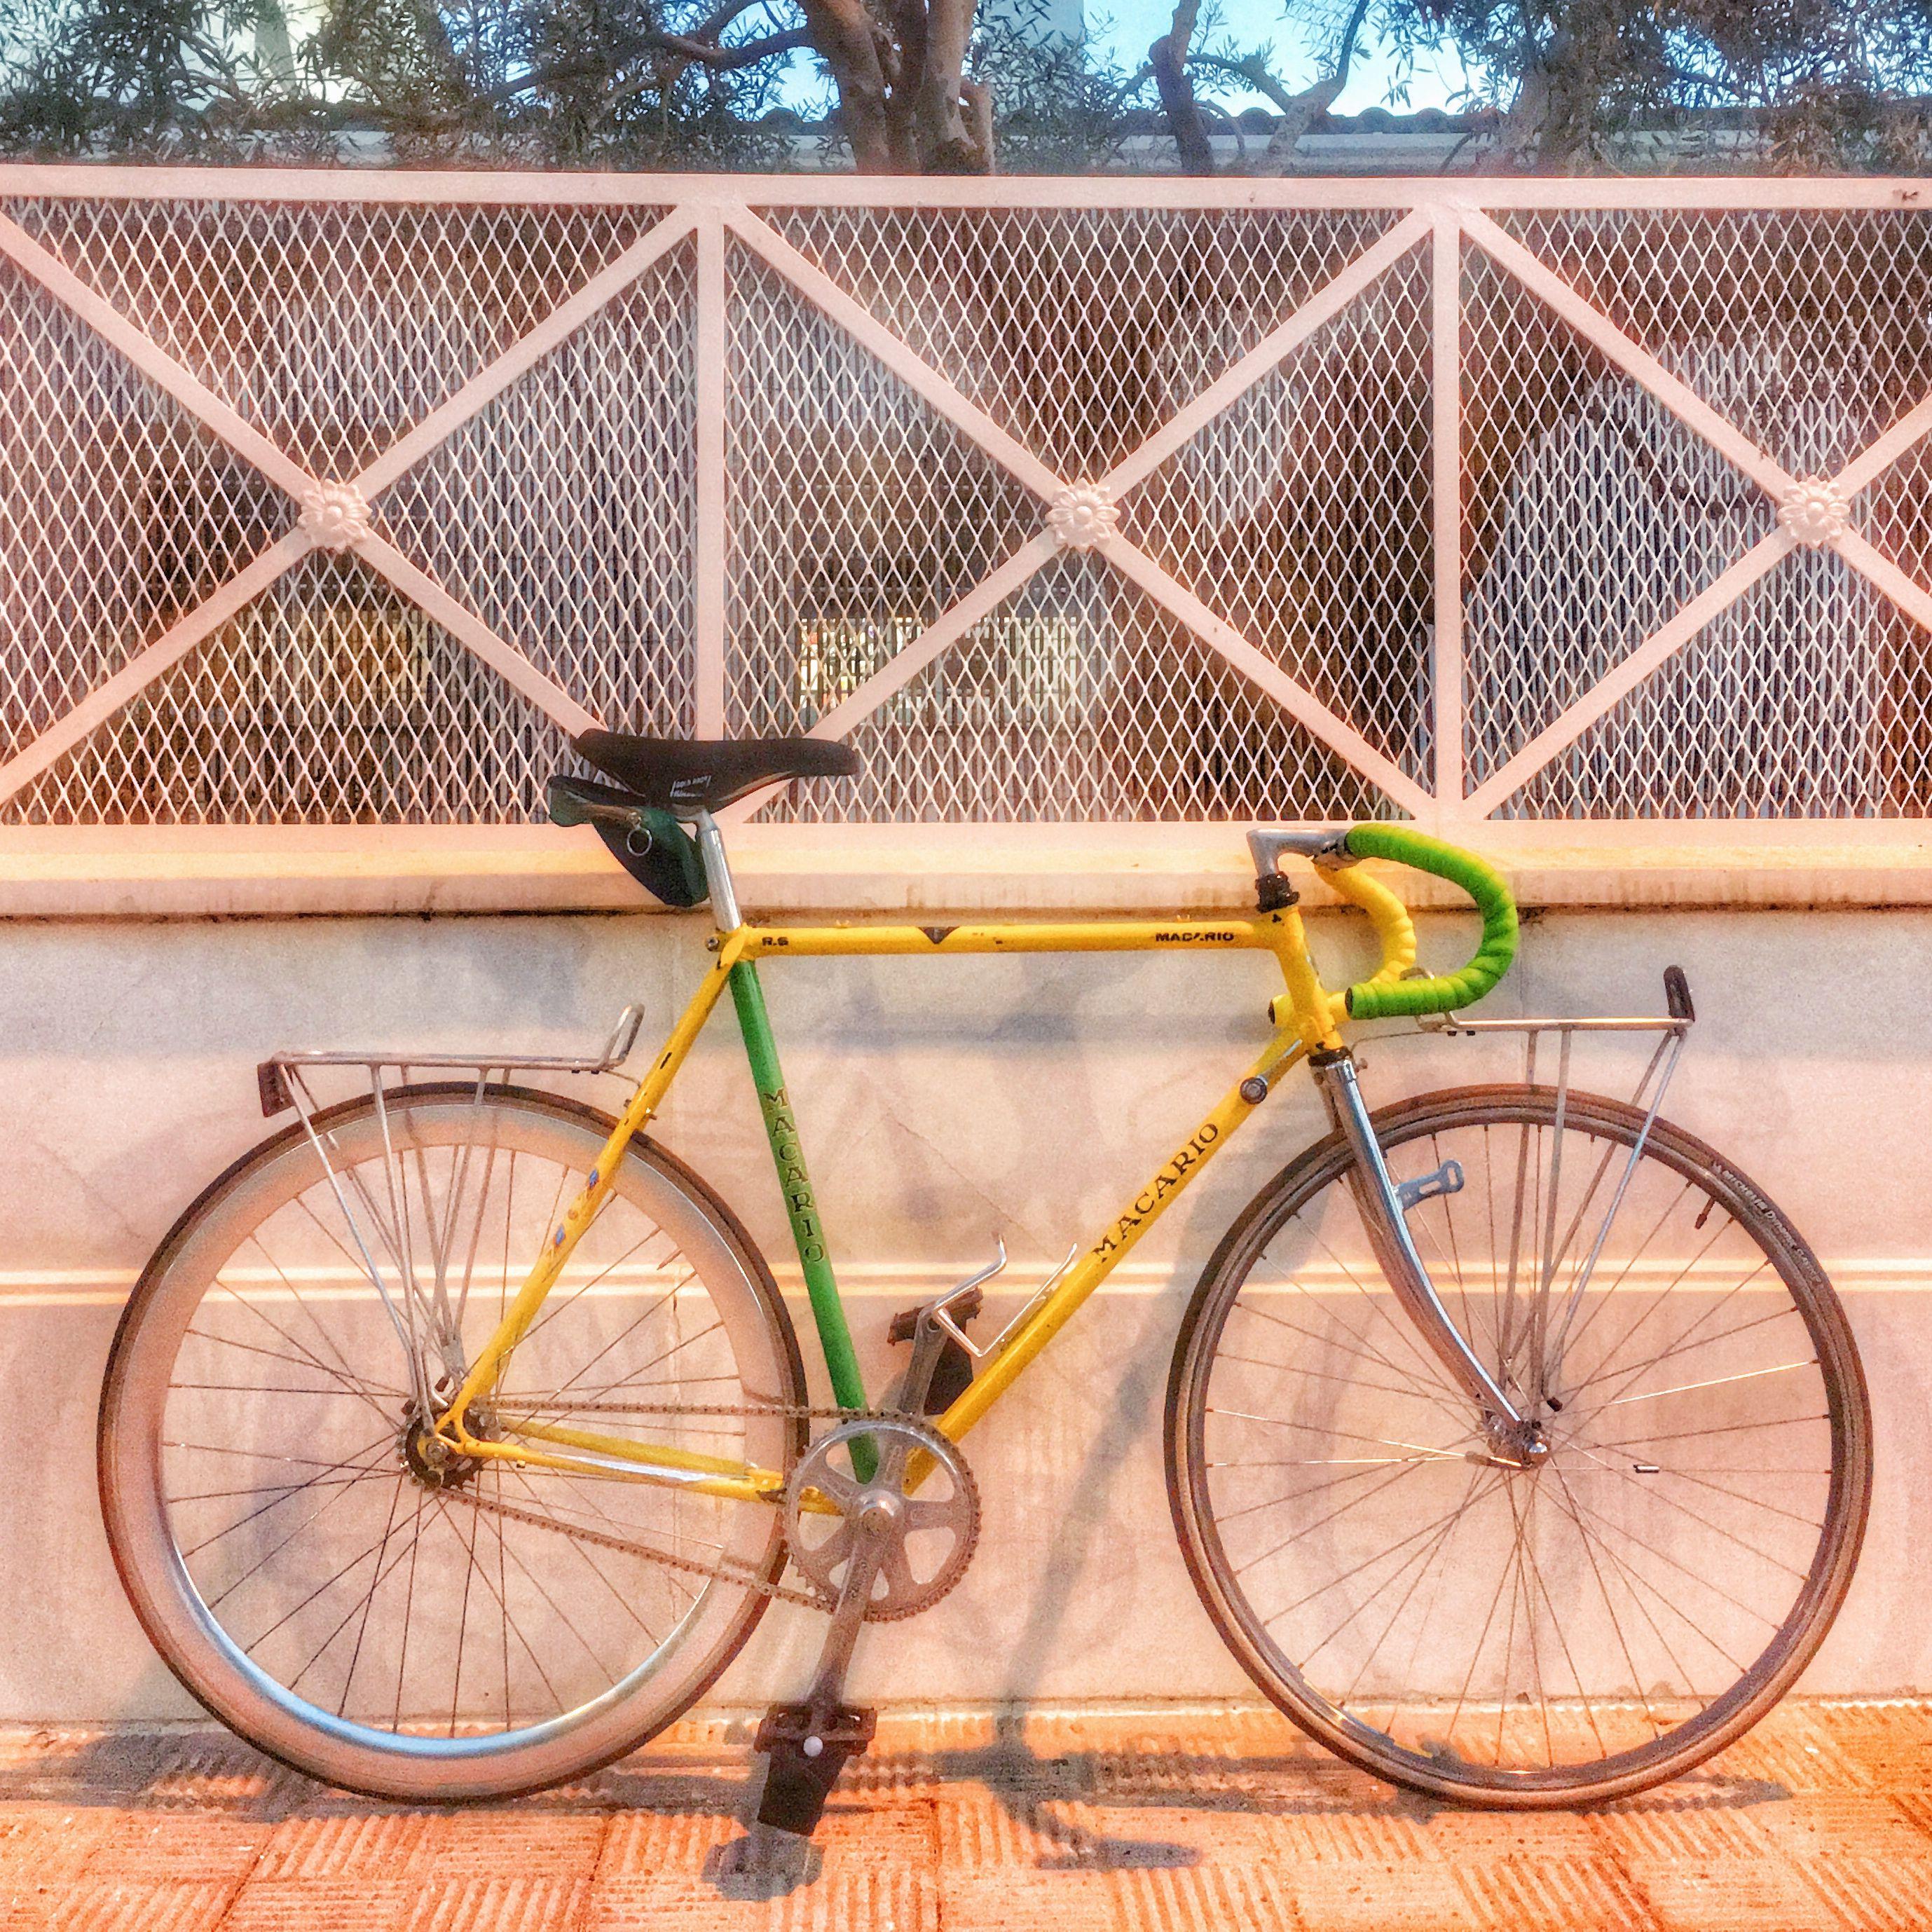 New restoration! Macario cycles. Fixie Randonneur, for every day commute. #randonneur #cycletowork #urbancycling #randonneuring #commute #commuterbike #commutebybike #fixedgear #fixiebike #fixieporn #fixate #classicbike #bicyclerestoration #bicycletouring #macario #macariocycles #bicicletasmacario